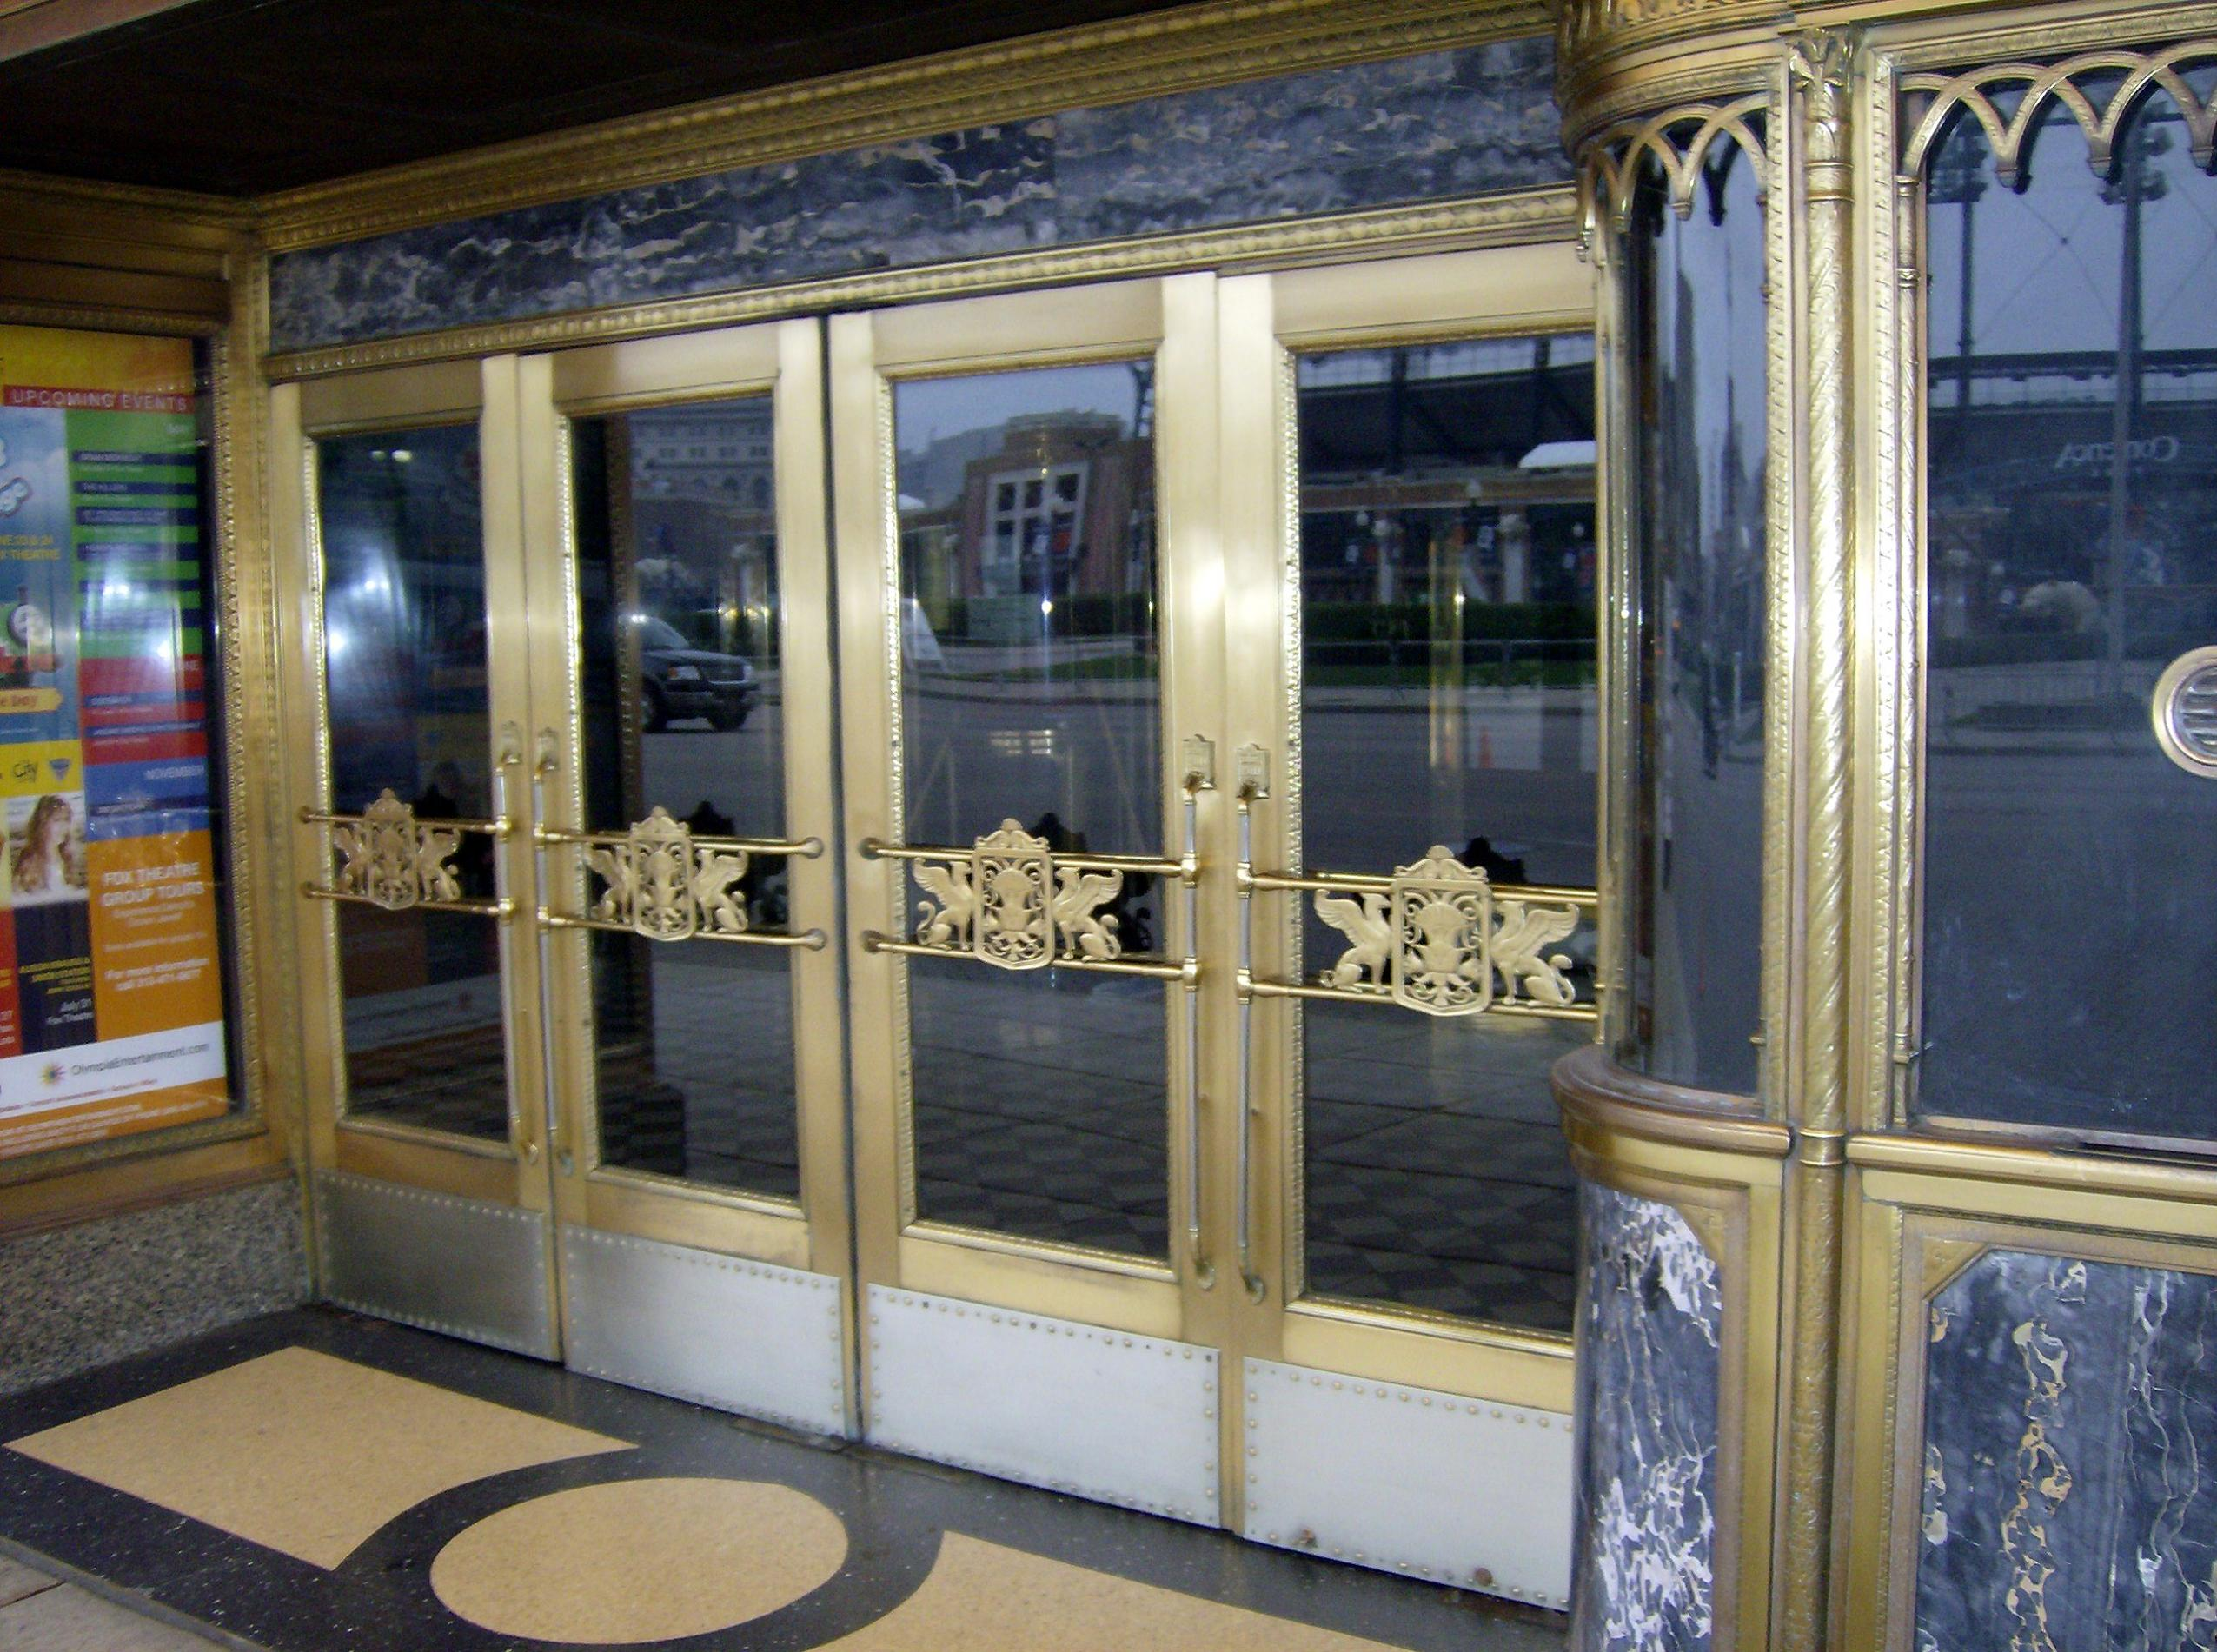 FileFox theatre doors.jpg & File:Fox theatre doors.jpg - Wikimedia Commons